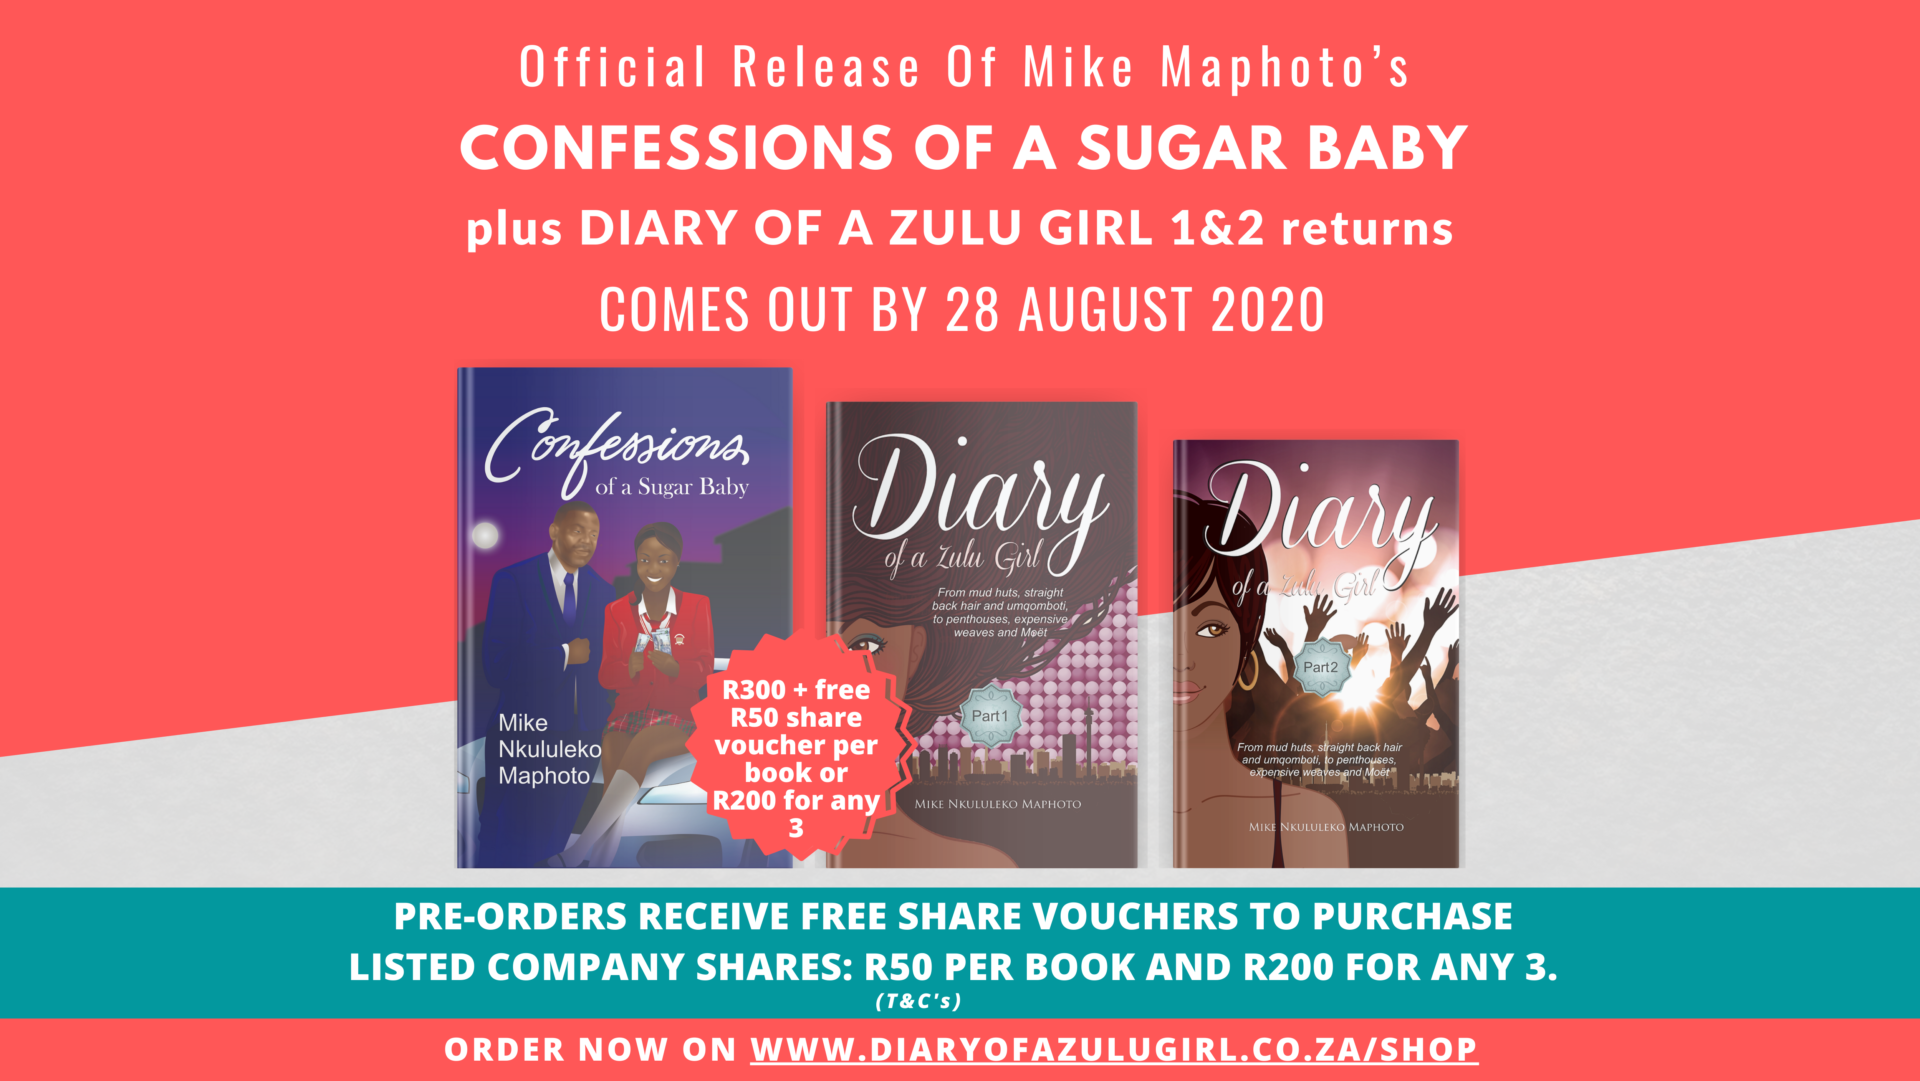 Diary of a Zulu Girl